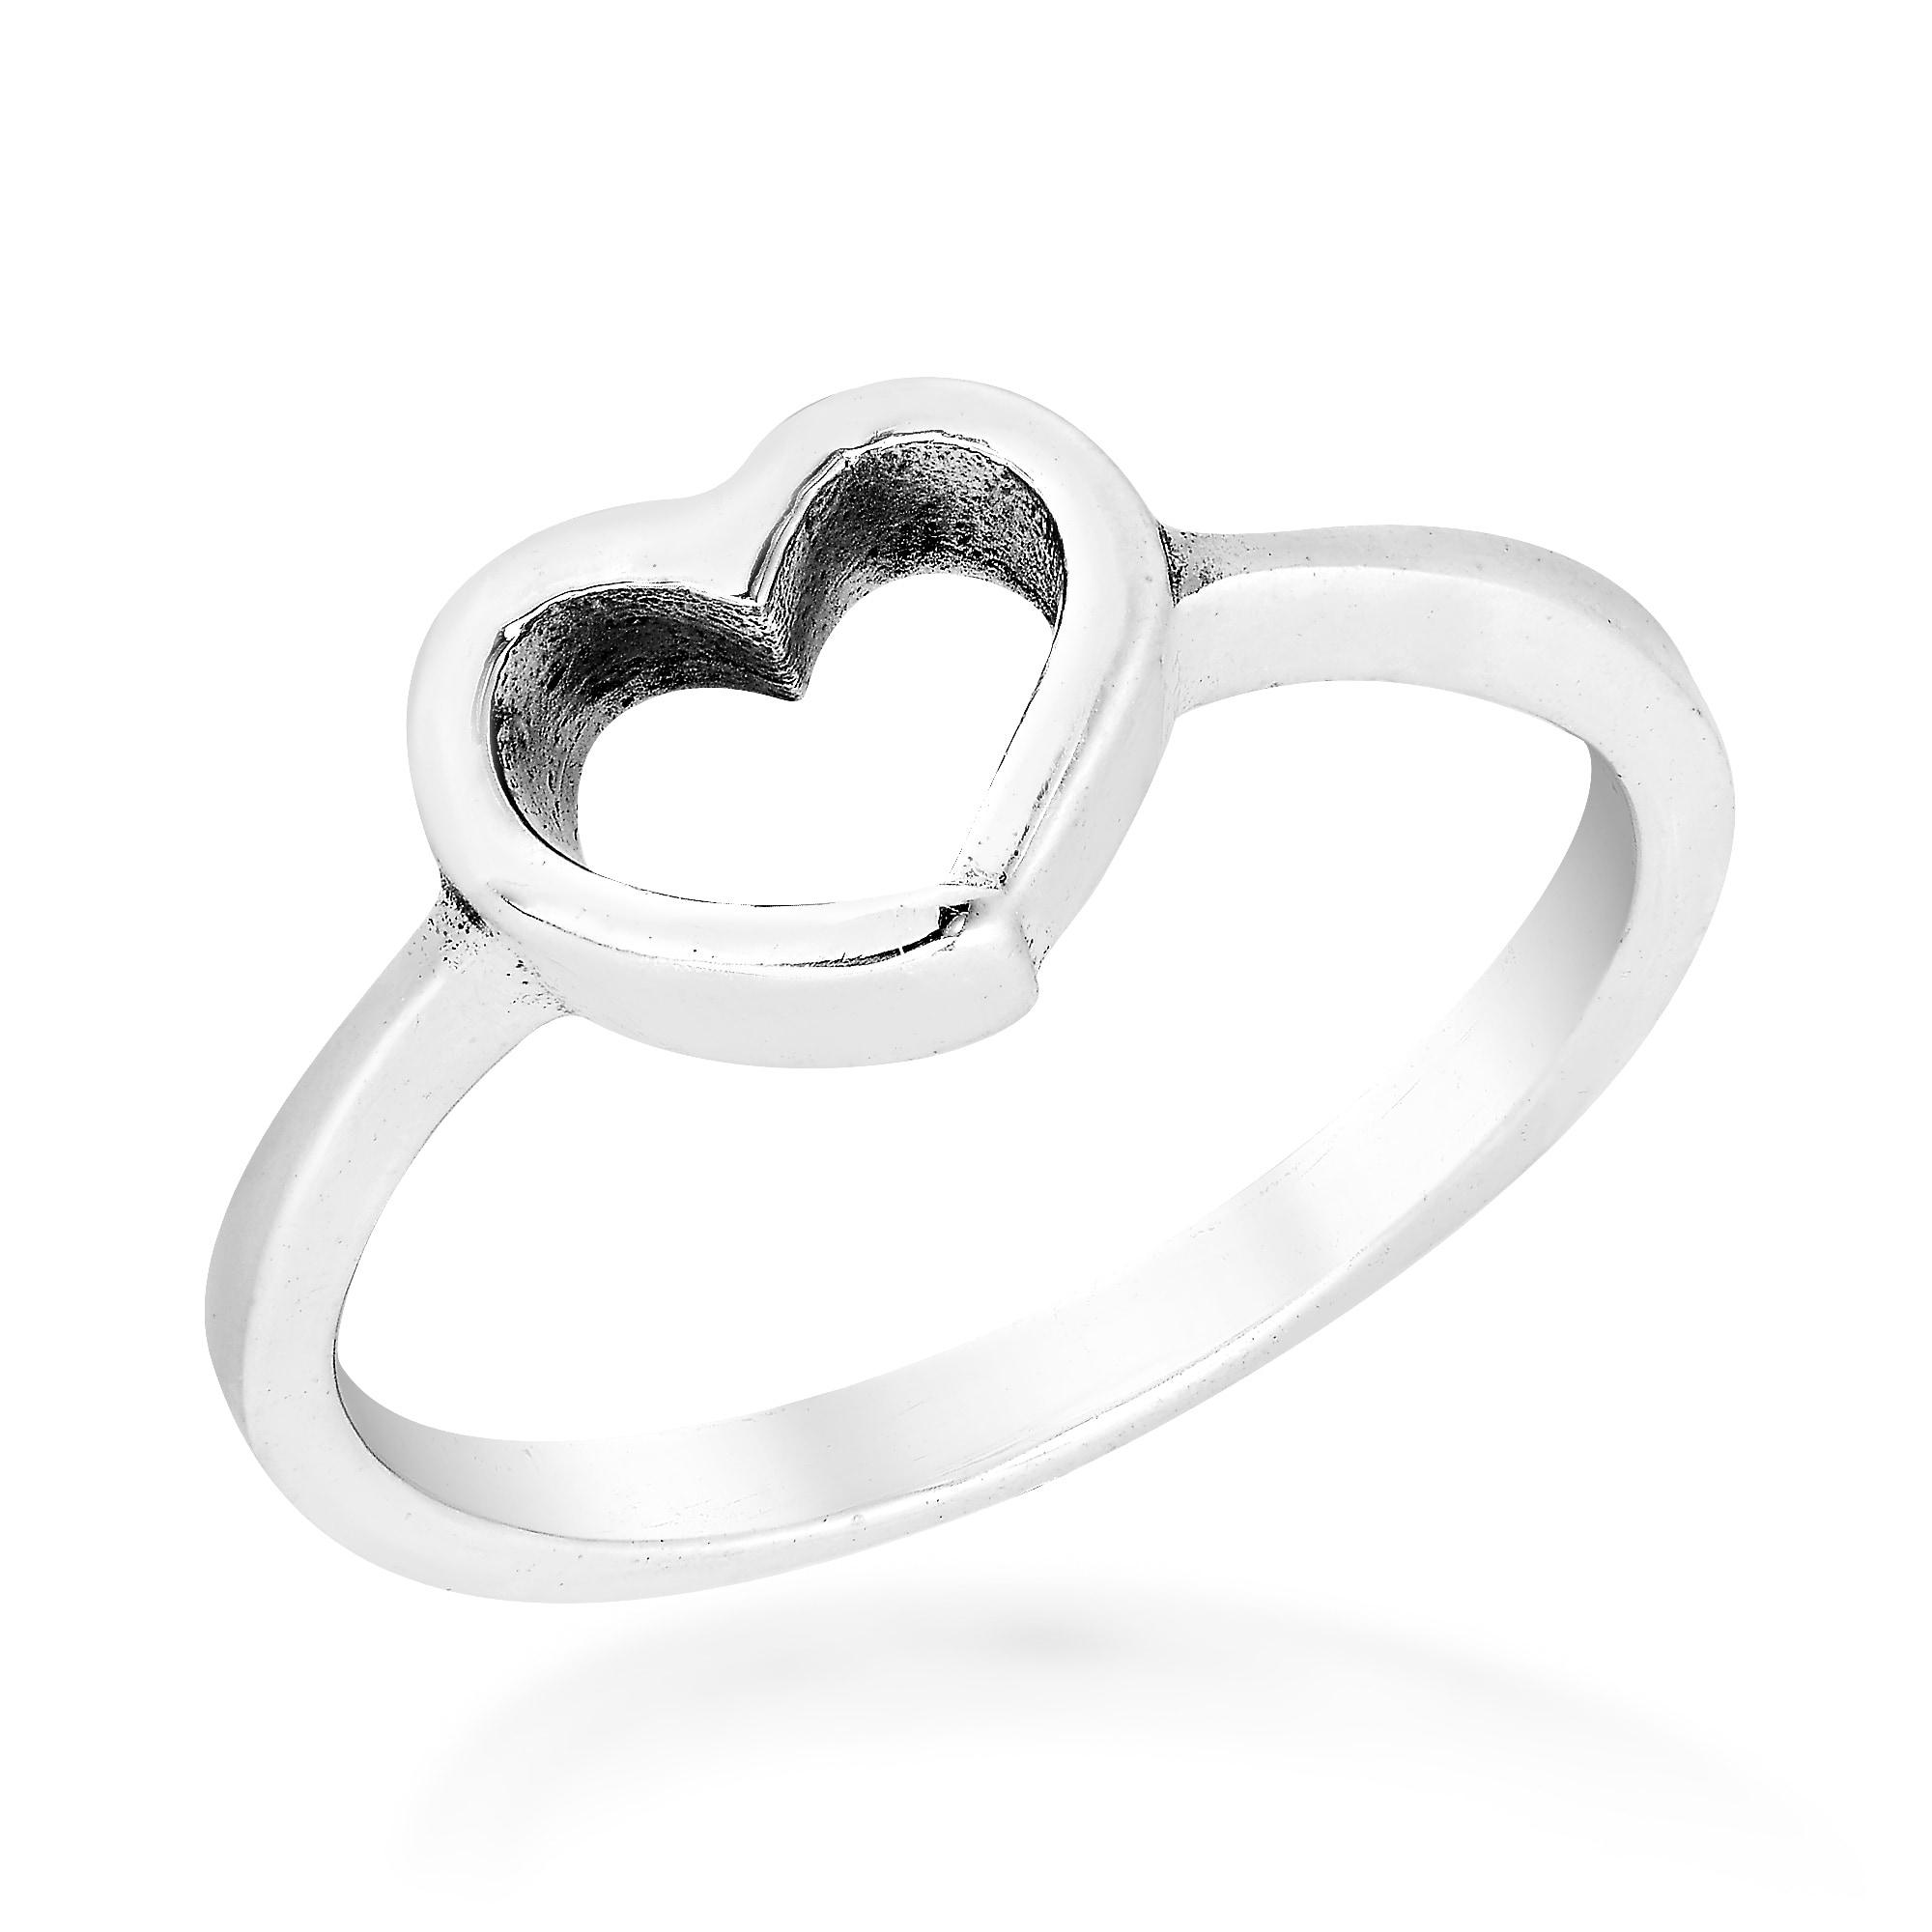 Handmade Heart Silver Ring